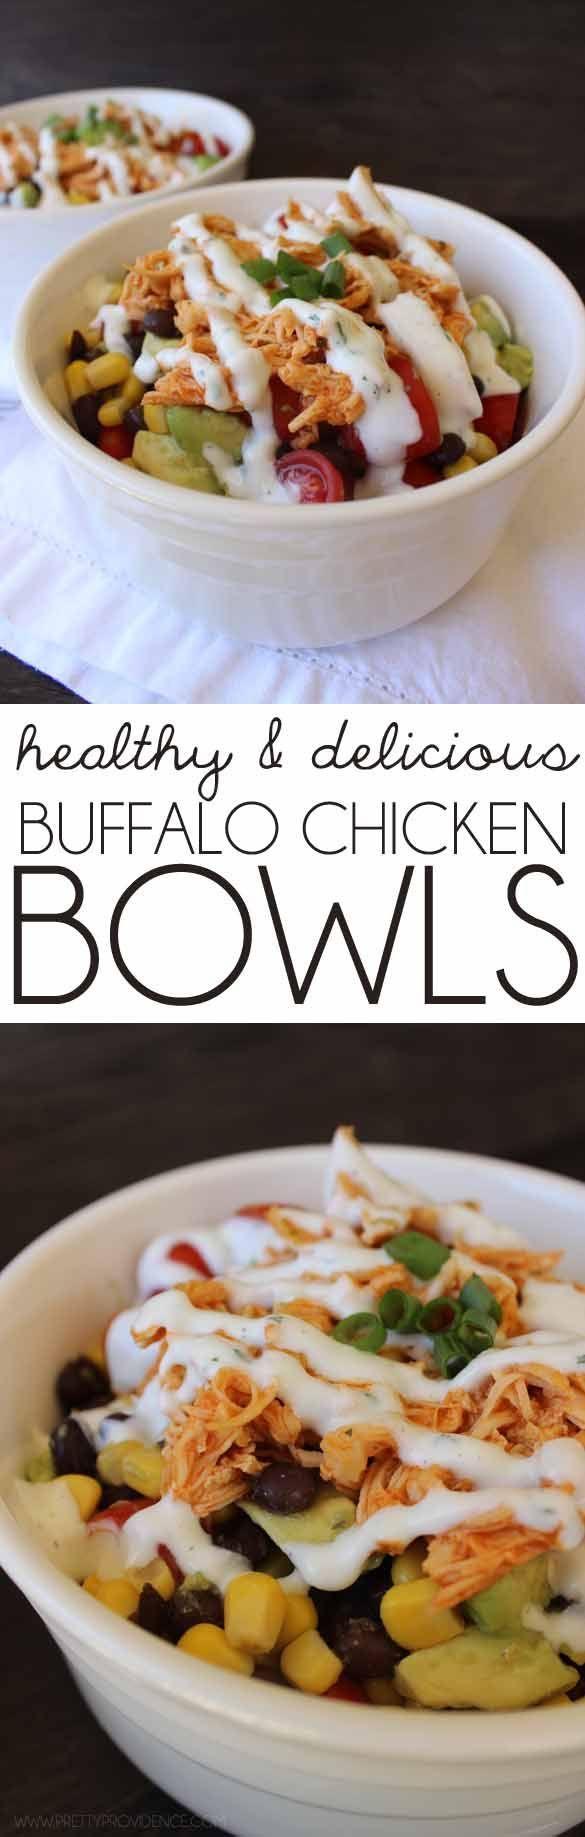 Gesunde Buffalo Chicken Bowls   – food